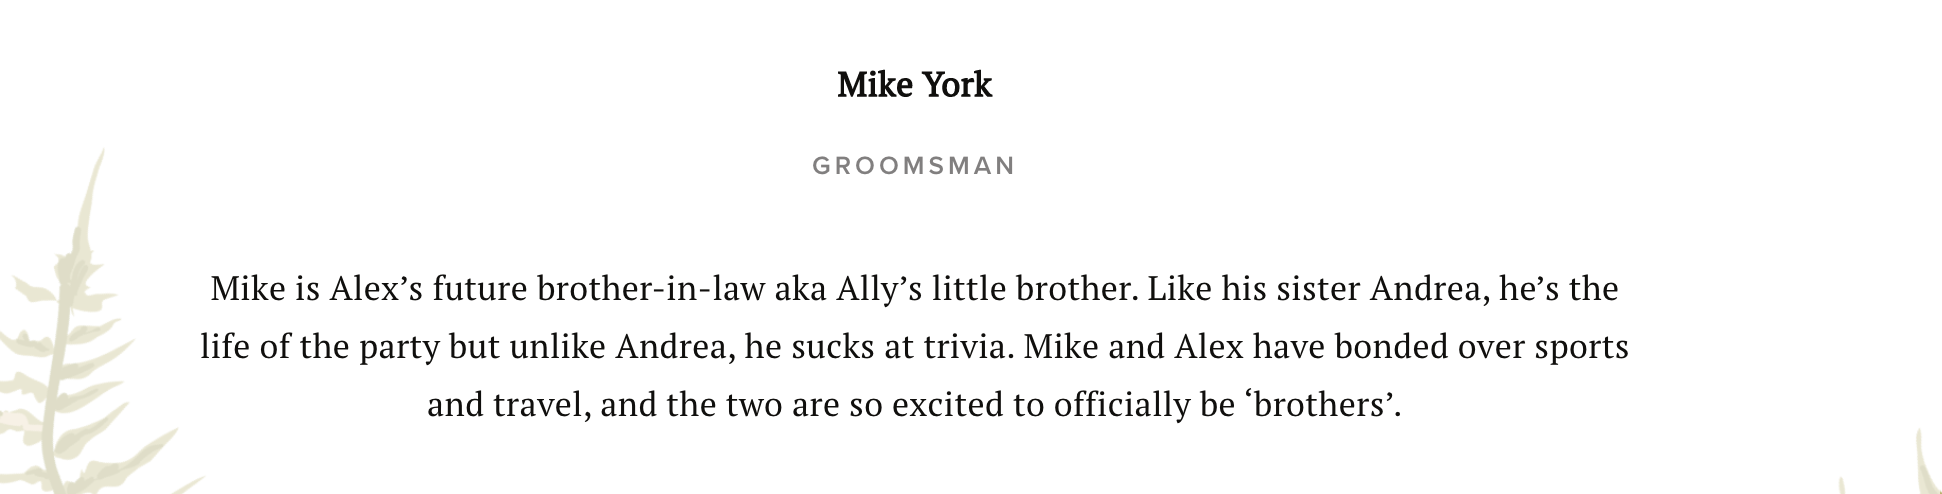 Wedding party bio example for a groomsman